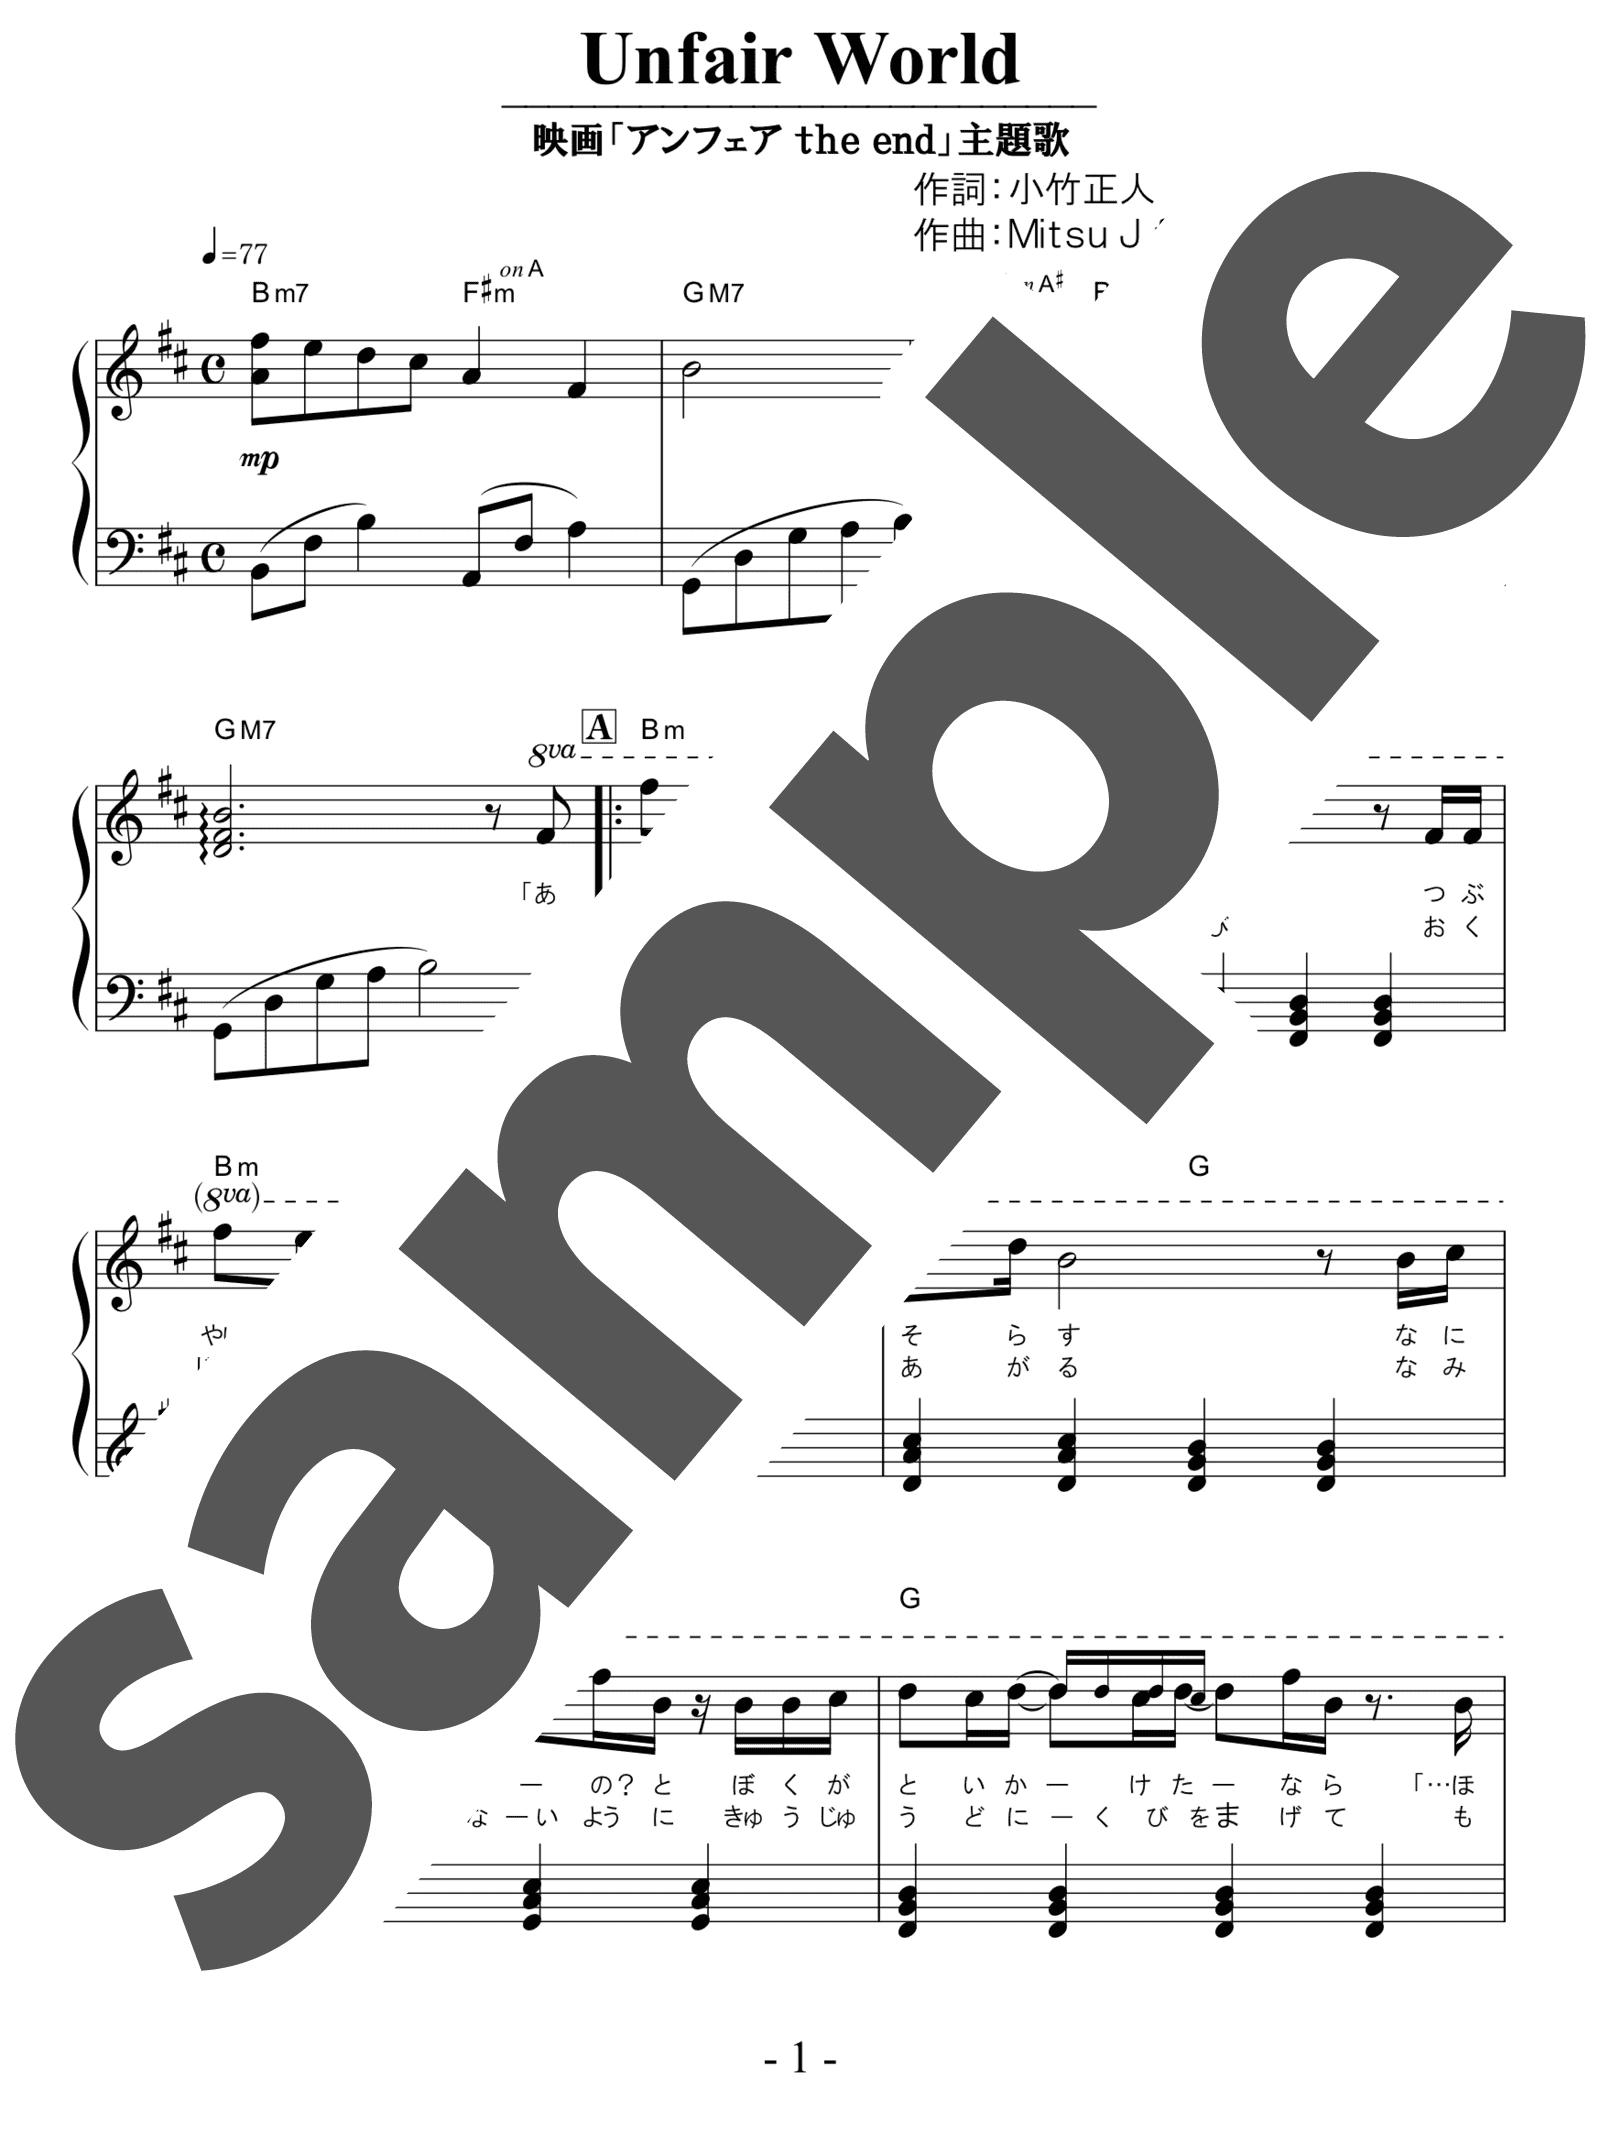 「Unfair World」のサンプル楽譜